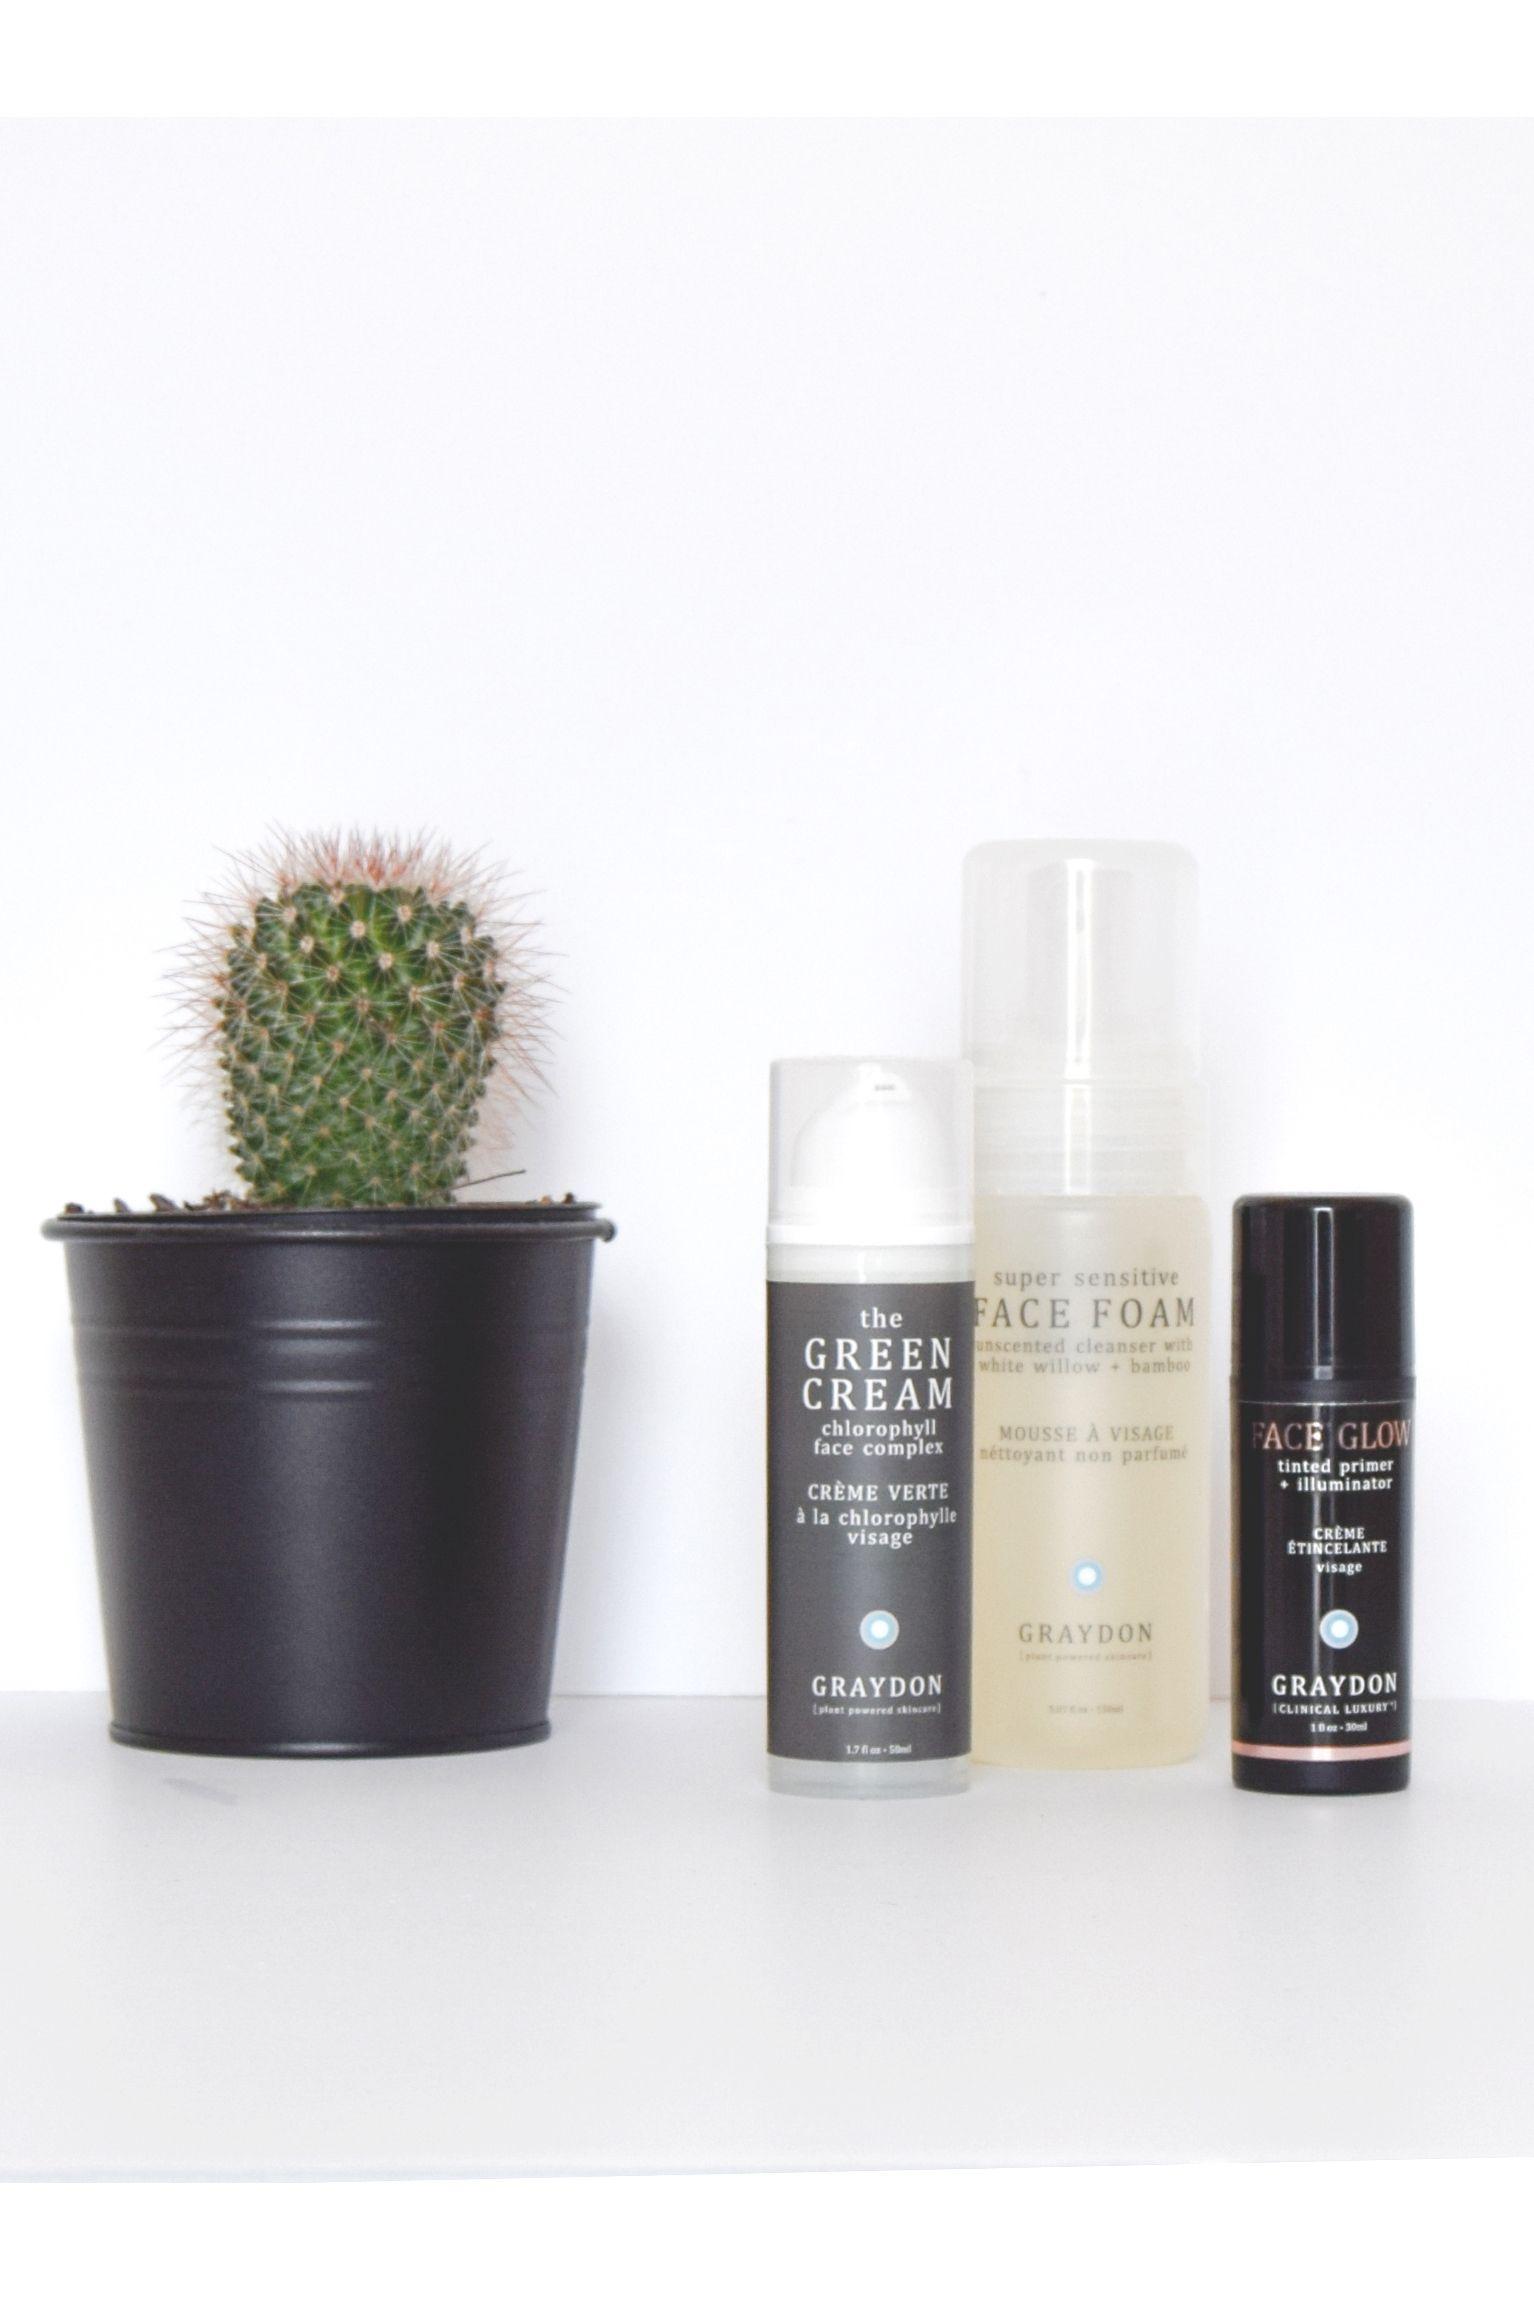 Graydon Skin care, Skincare online, Skin care brands